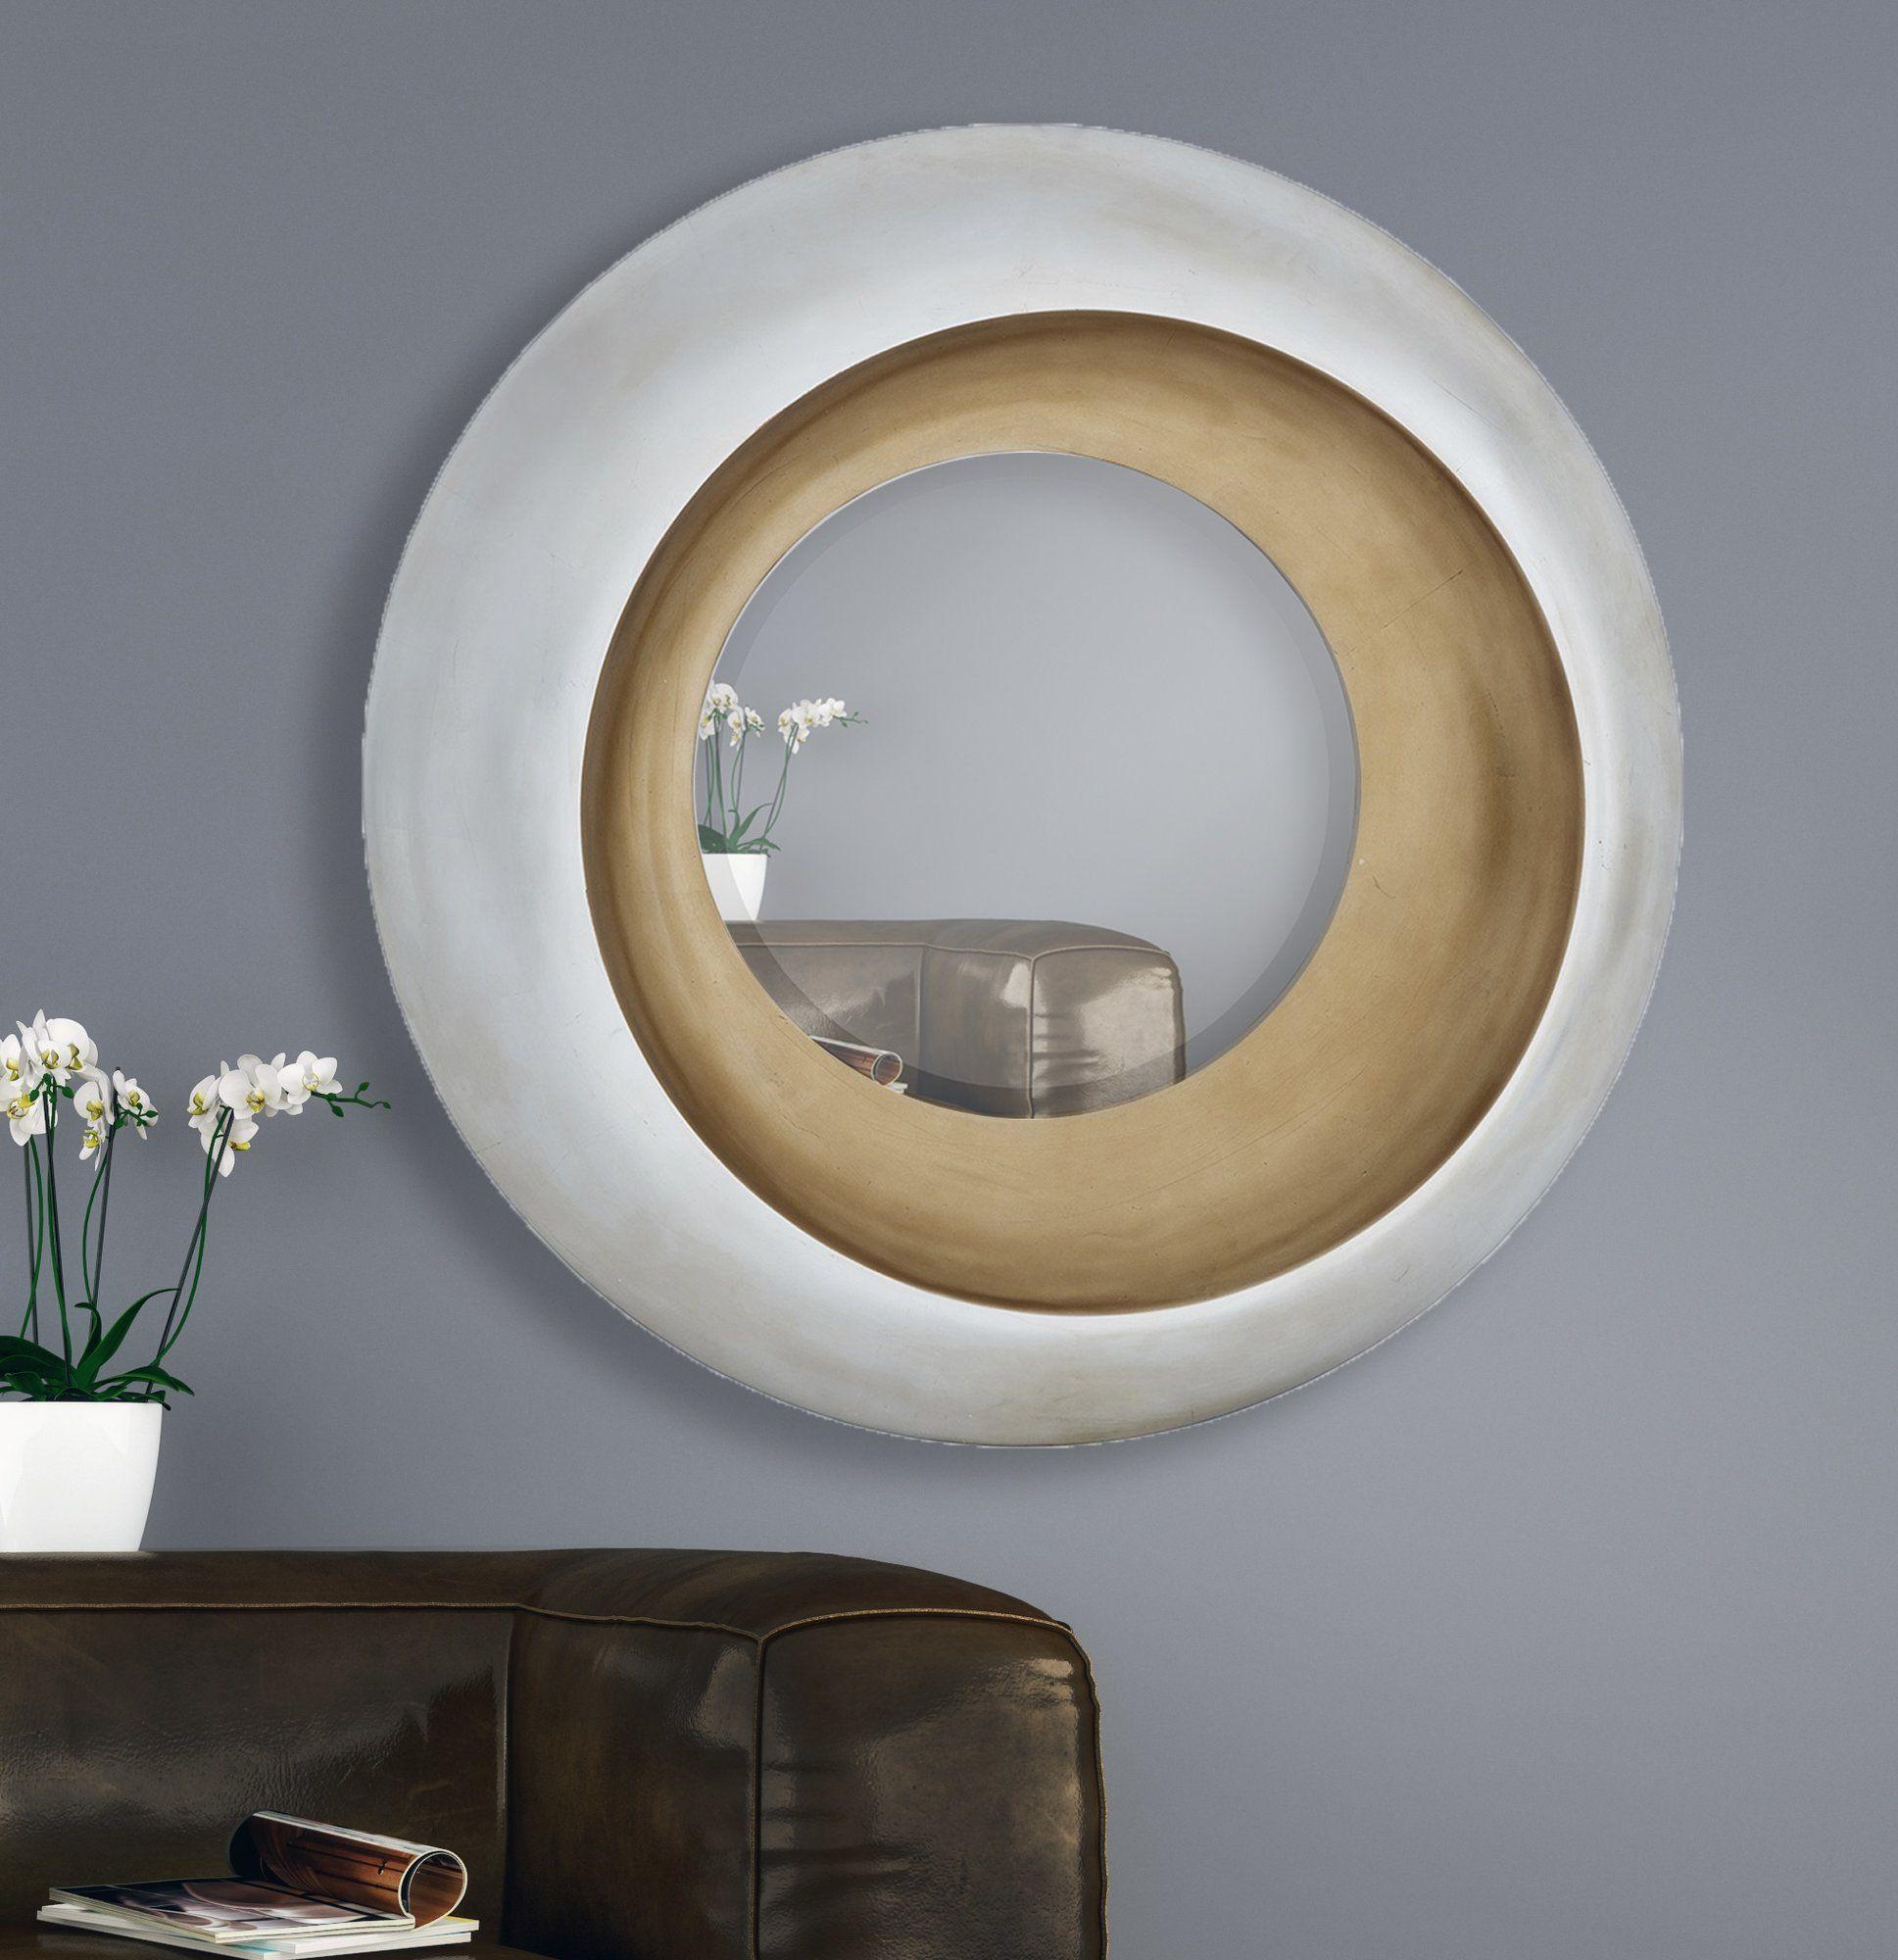 eyeopening cool ideas big wall mirror entry ways wall mirror